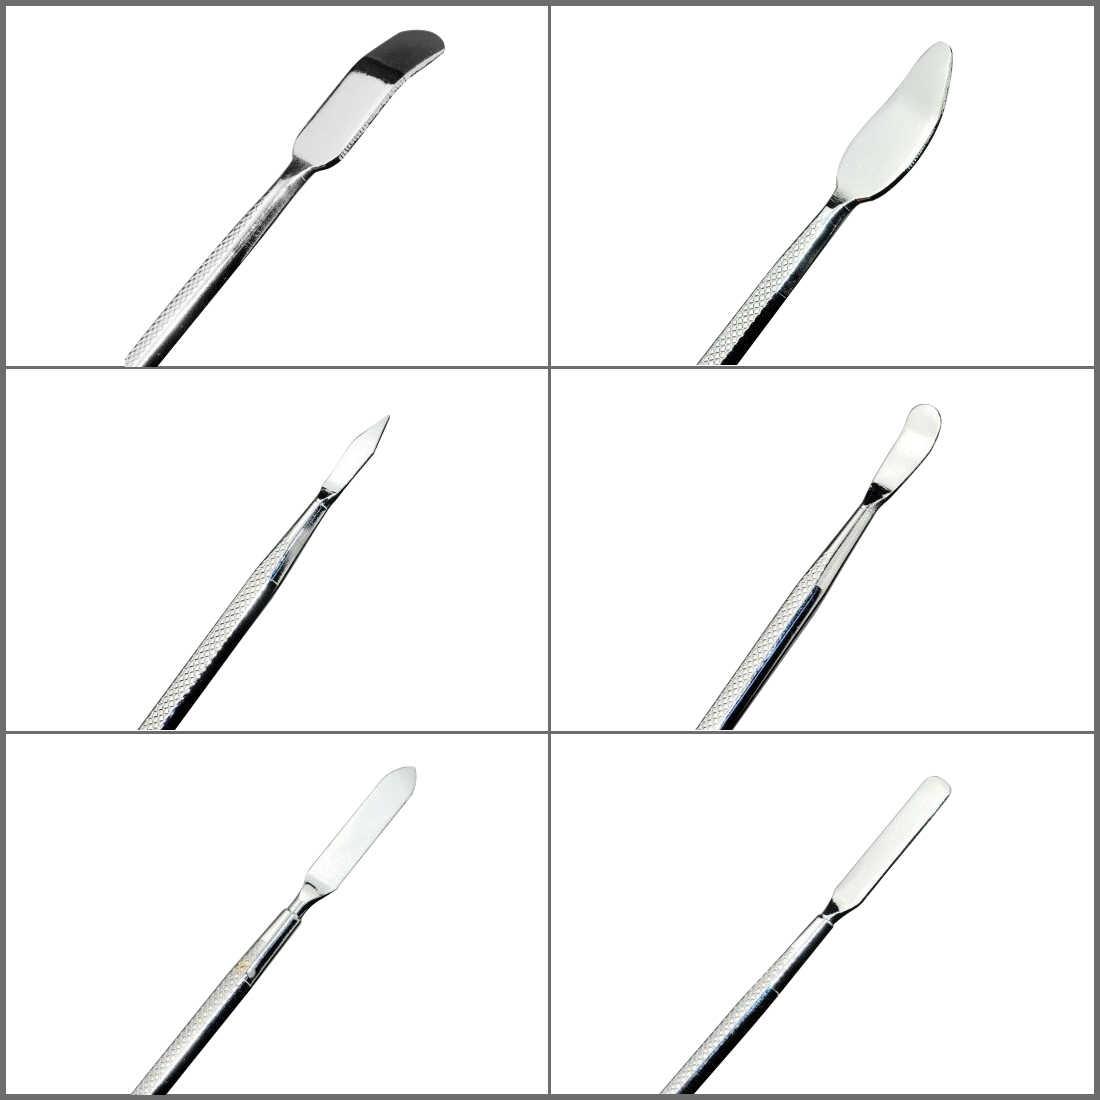 3pcs universal metal spudger mobile phone repair tools strumenti opening  herramientas for iphone samsung laptop tablet tool set|hand tool sets| -  aliexpress  aliexpress